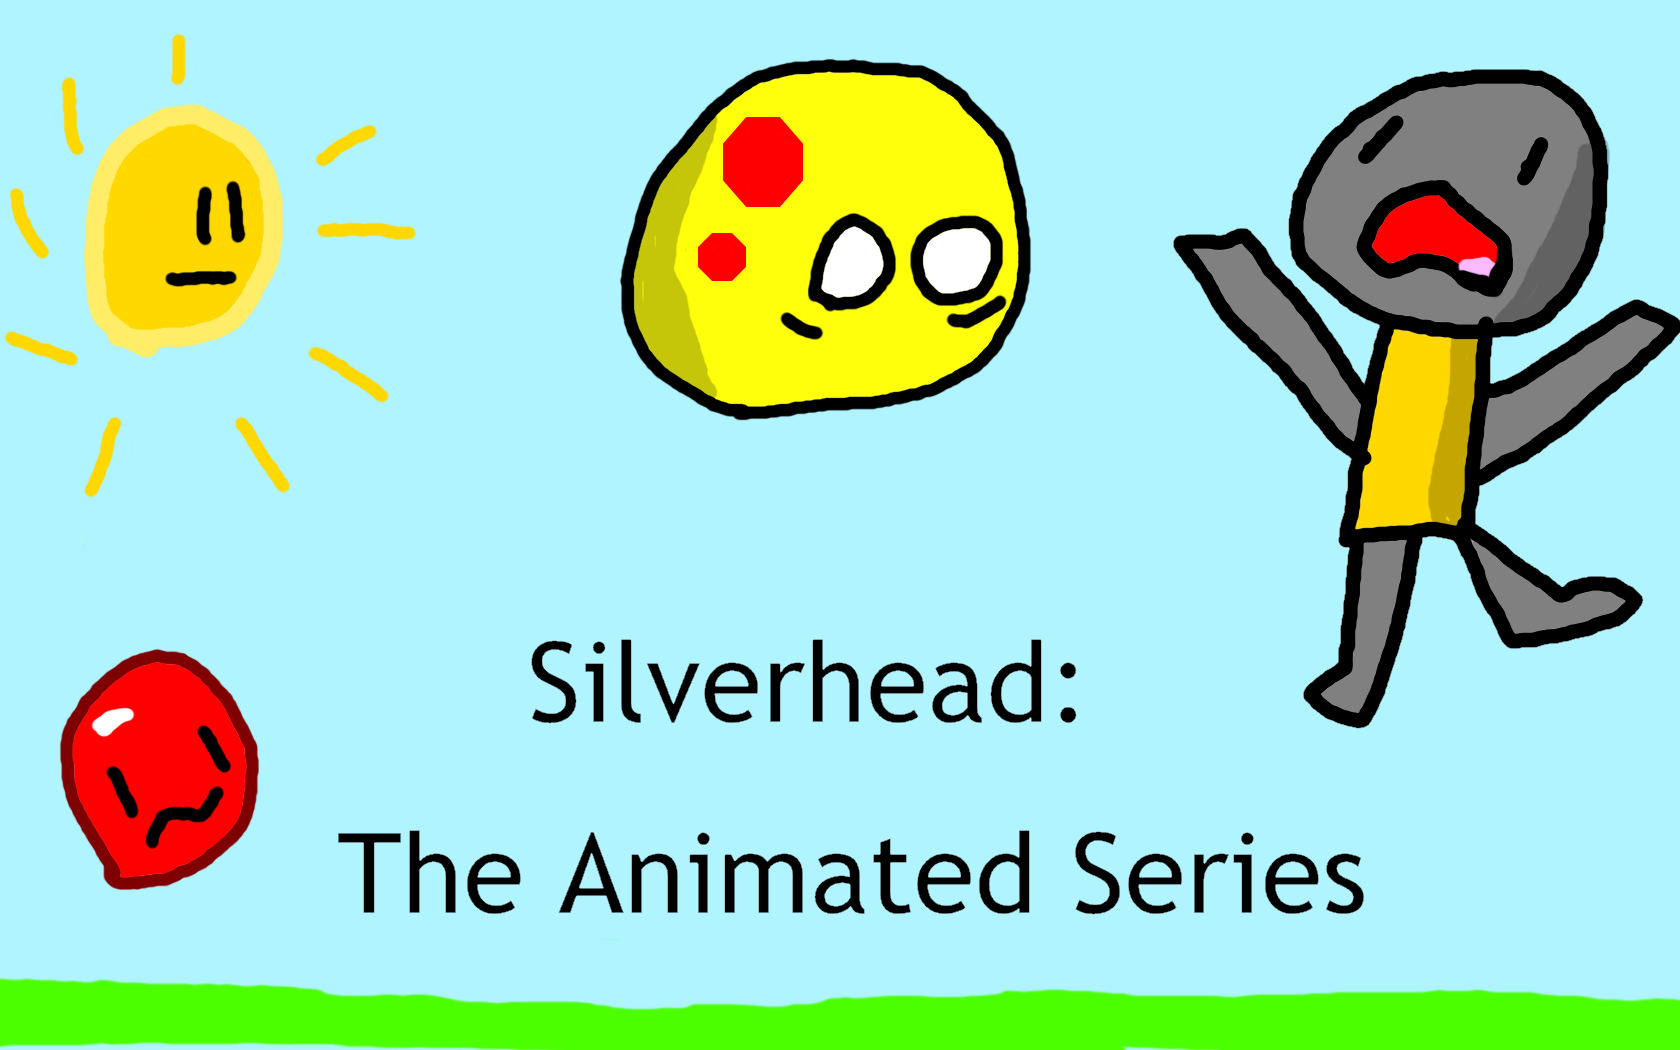 Silverhead: The Animated Series